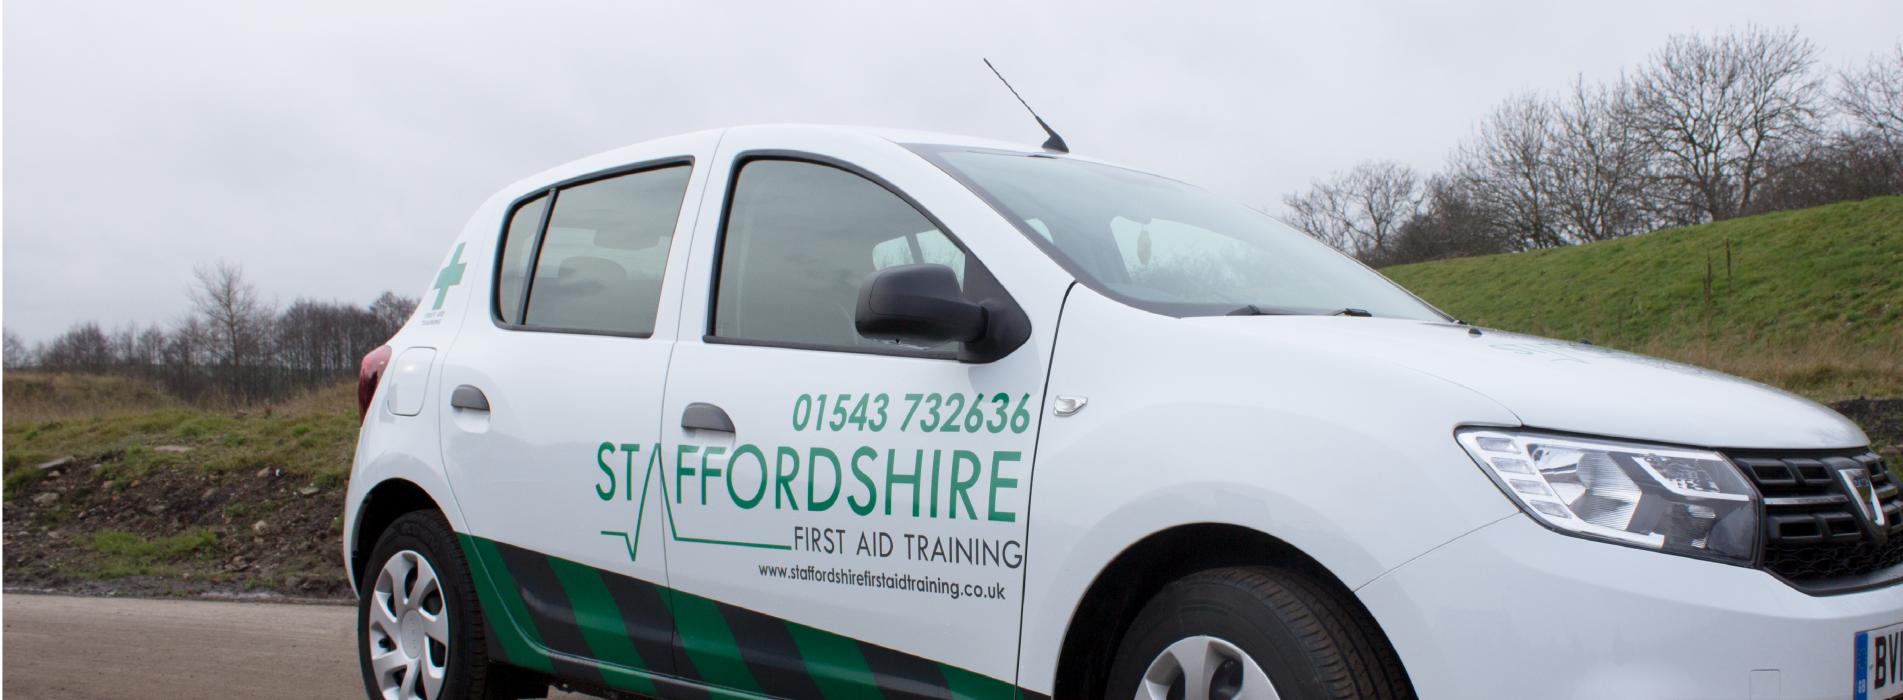 Dorchester first aid training